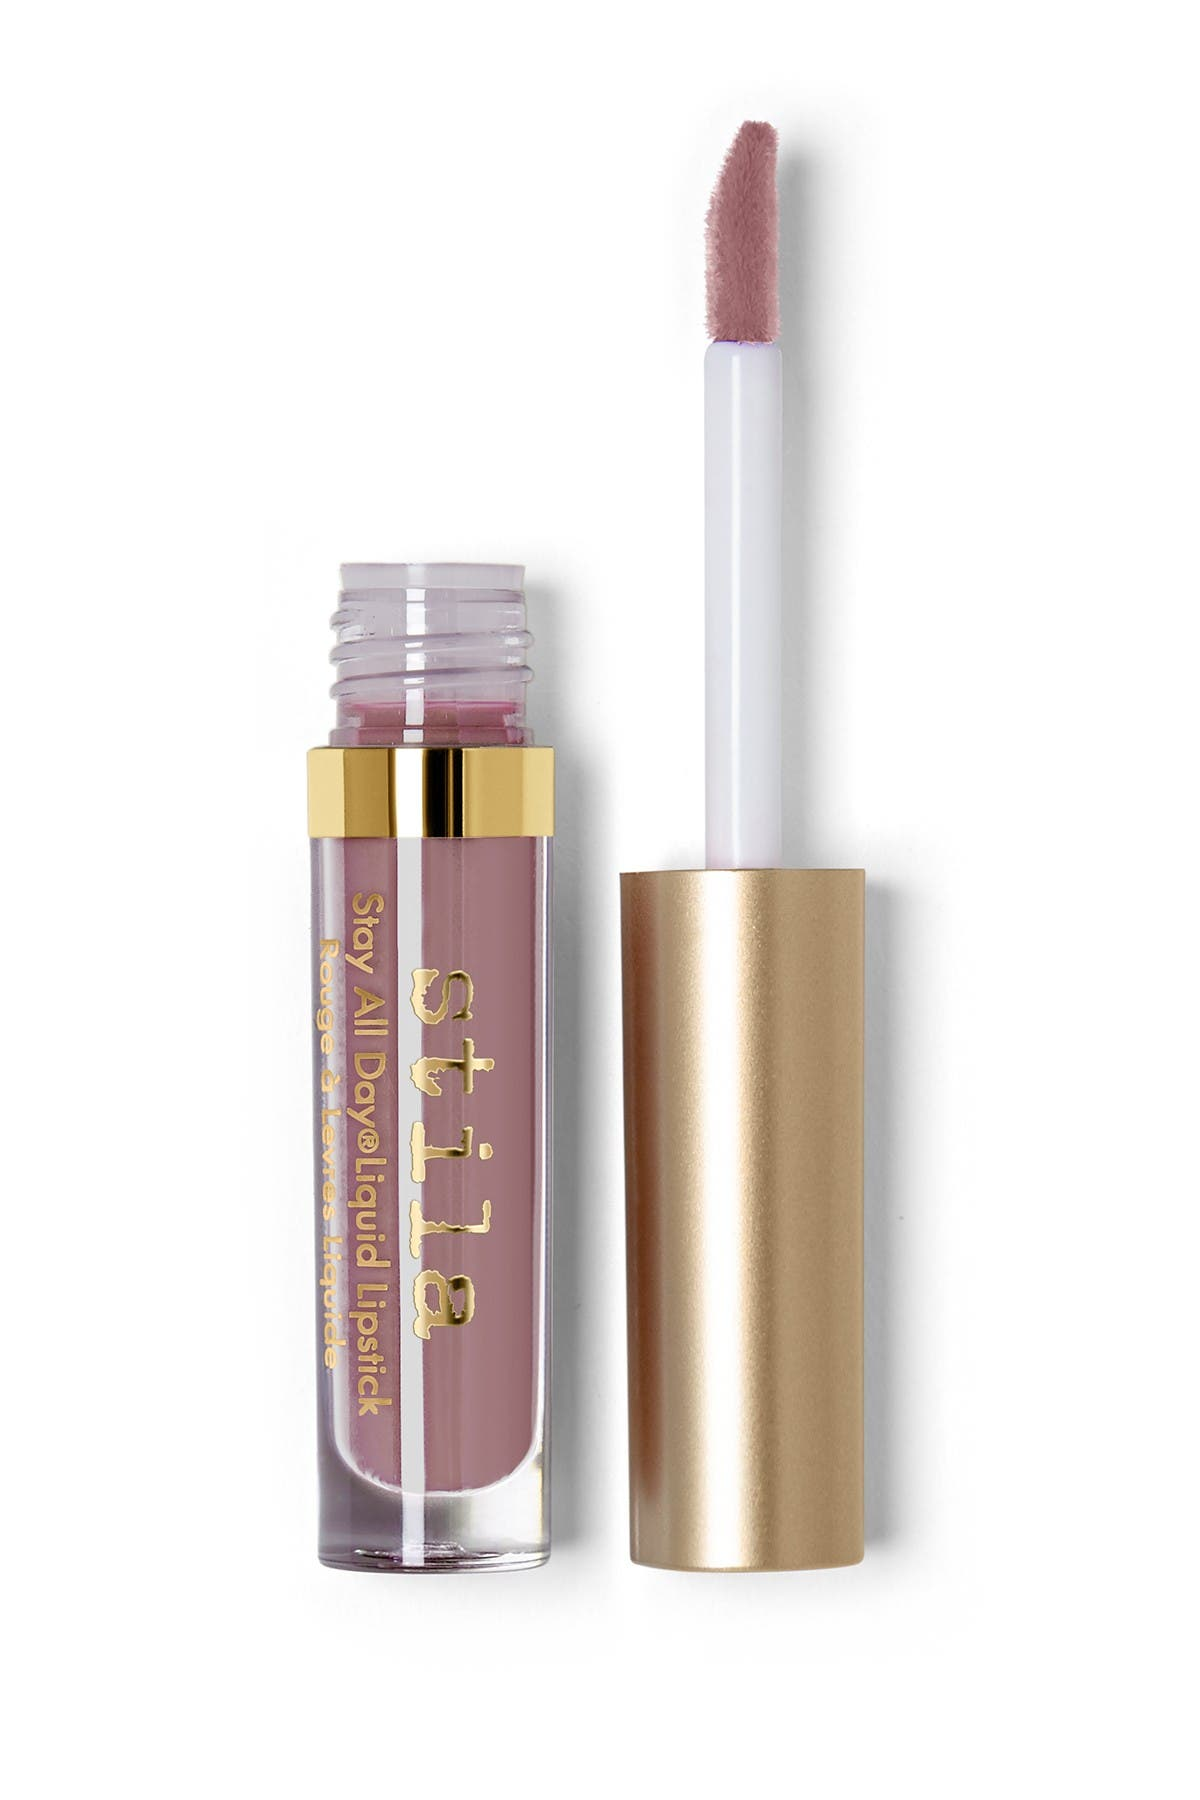 Image of Stila Stay All Day® Liquid Lipstick, 0.05 fl oz - Travel Size